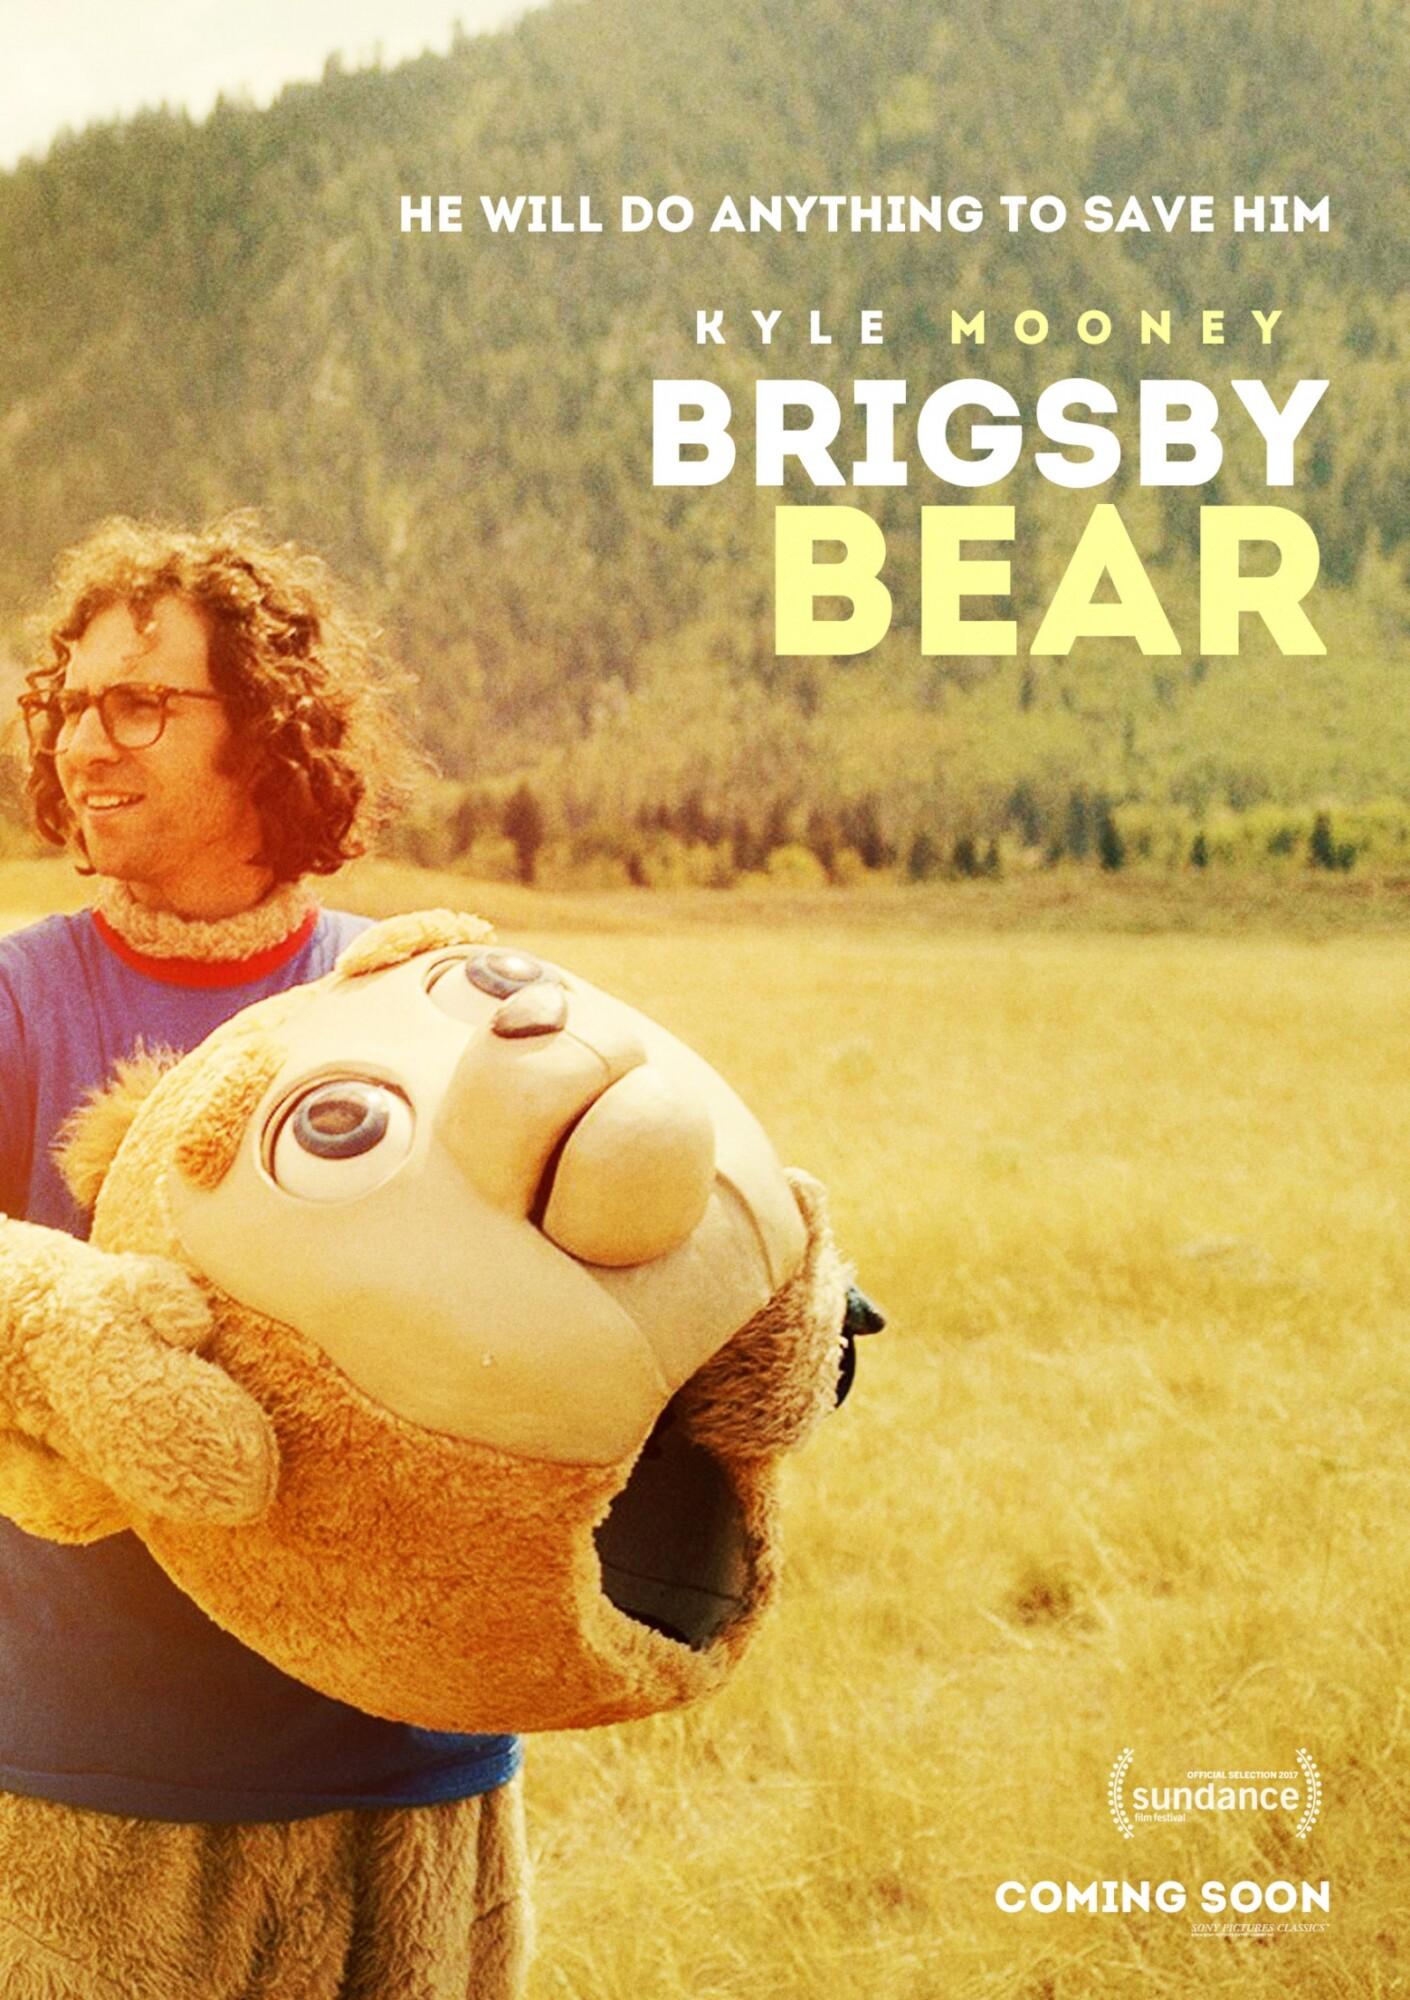 https://posterspy.com/wp-content/uploads/2017/02/Poster-2017-Brisgby-Bear.jpg